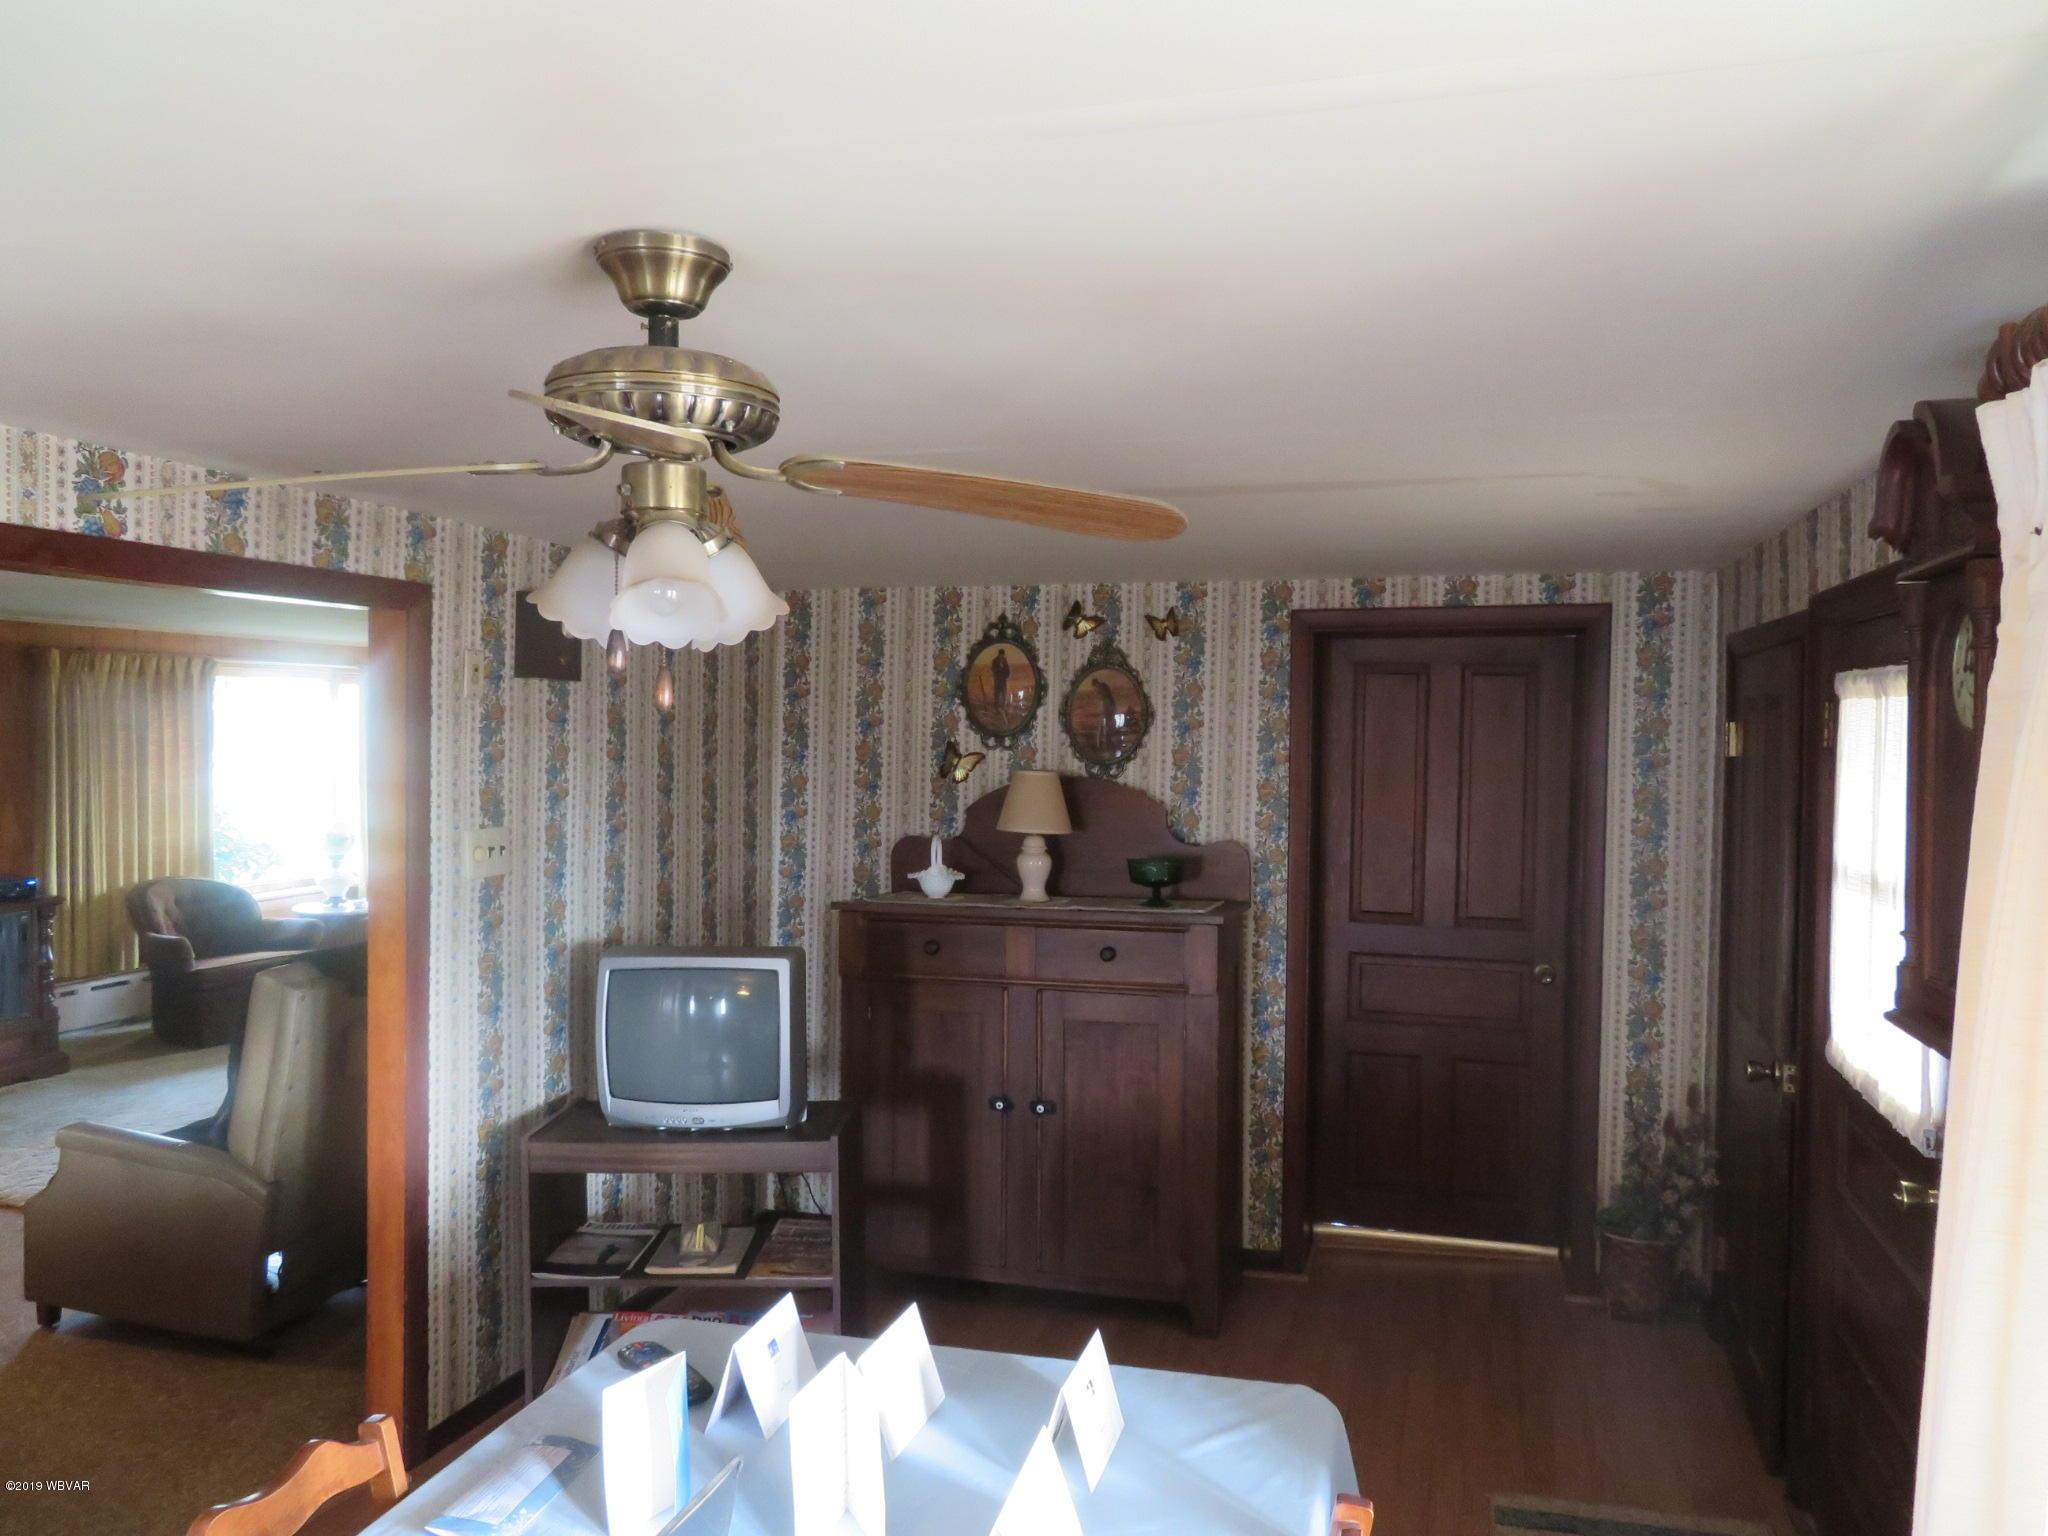 531 KAUFFMAN ROAD, Dornsife, PA 17823, 4 Bedrooms Bedrooms, ,1 BathroomBathrooms,Farm,For sale,KAUFFMAN,WB-86204